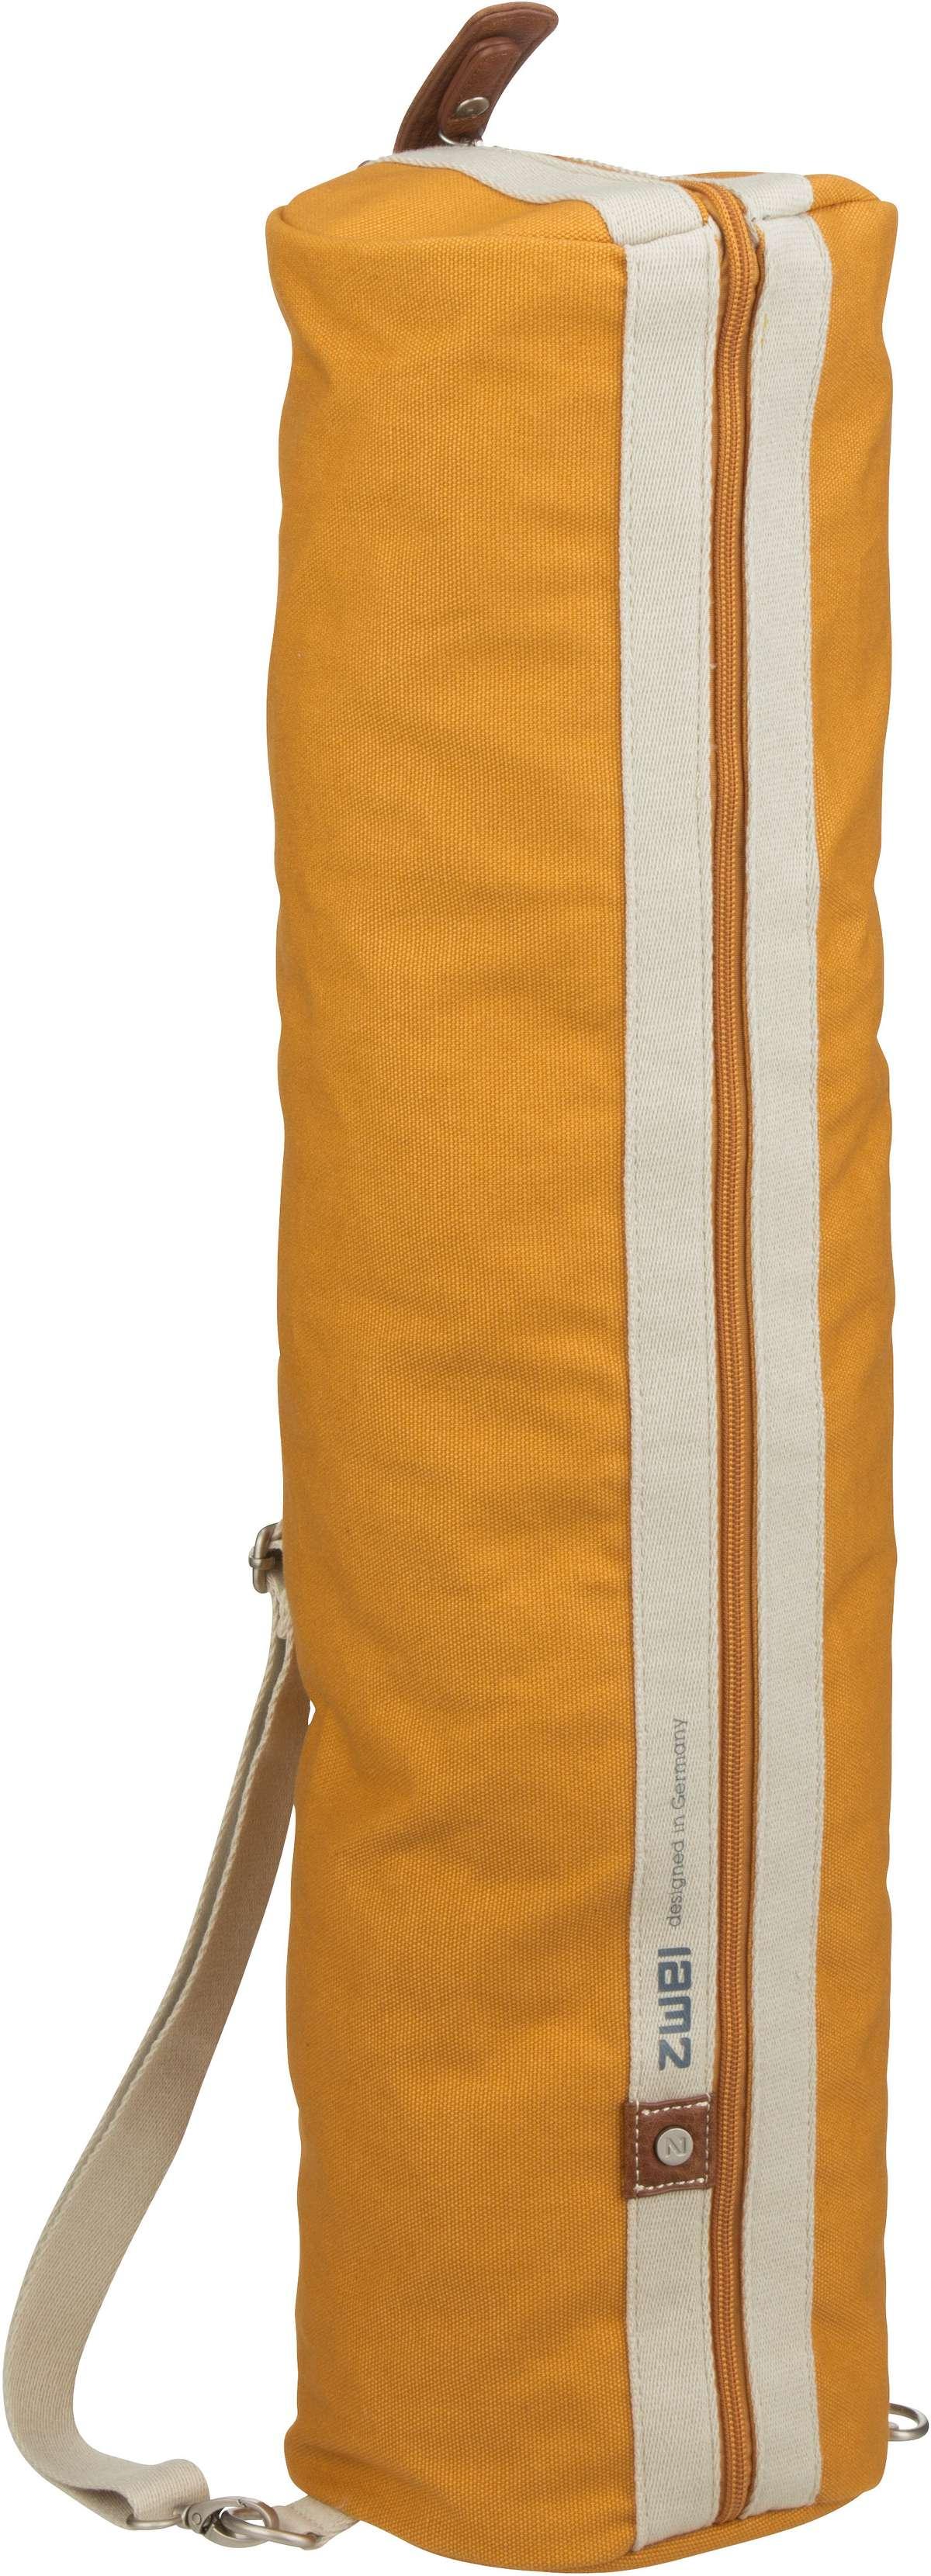 Rucksack / Daypack Yoga Y108 Yellow (13 Liter)